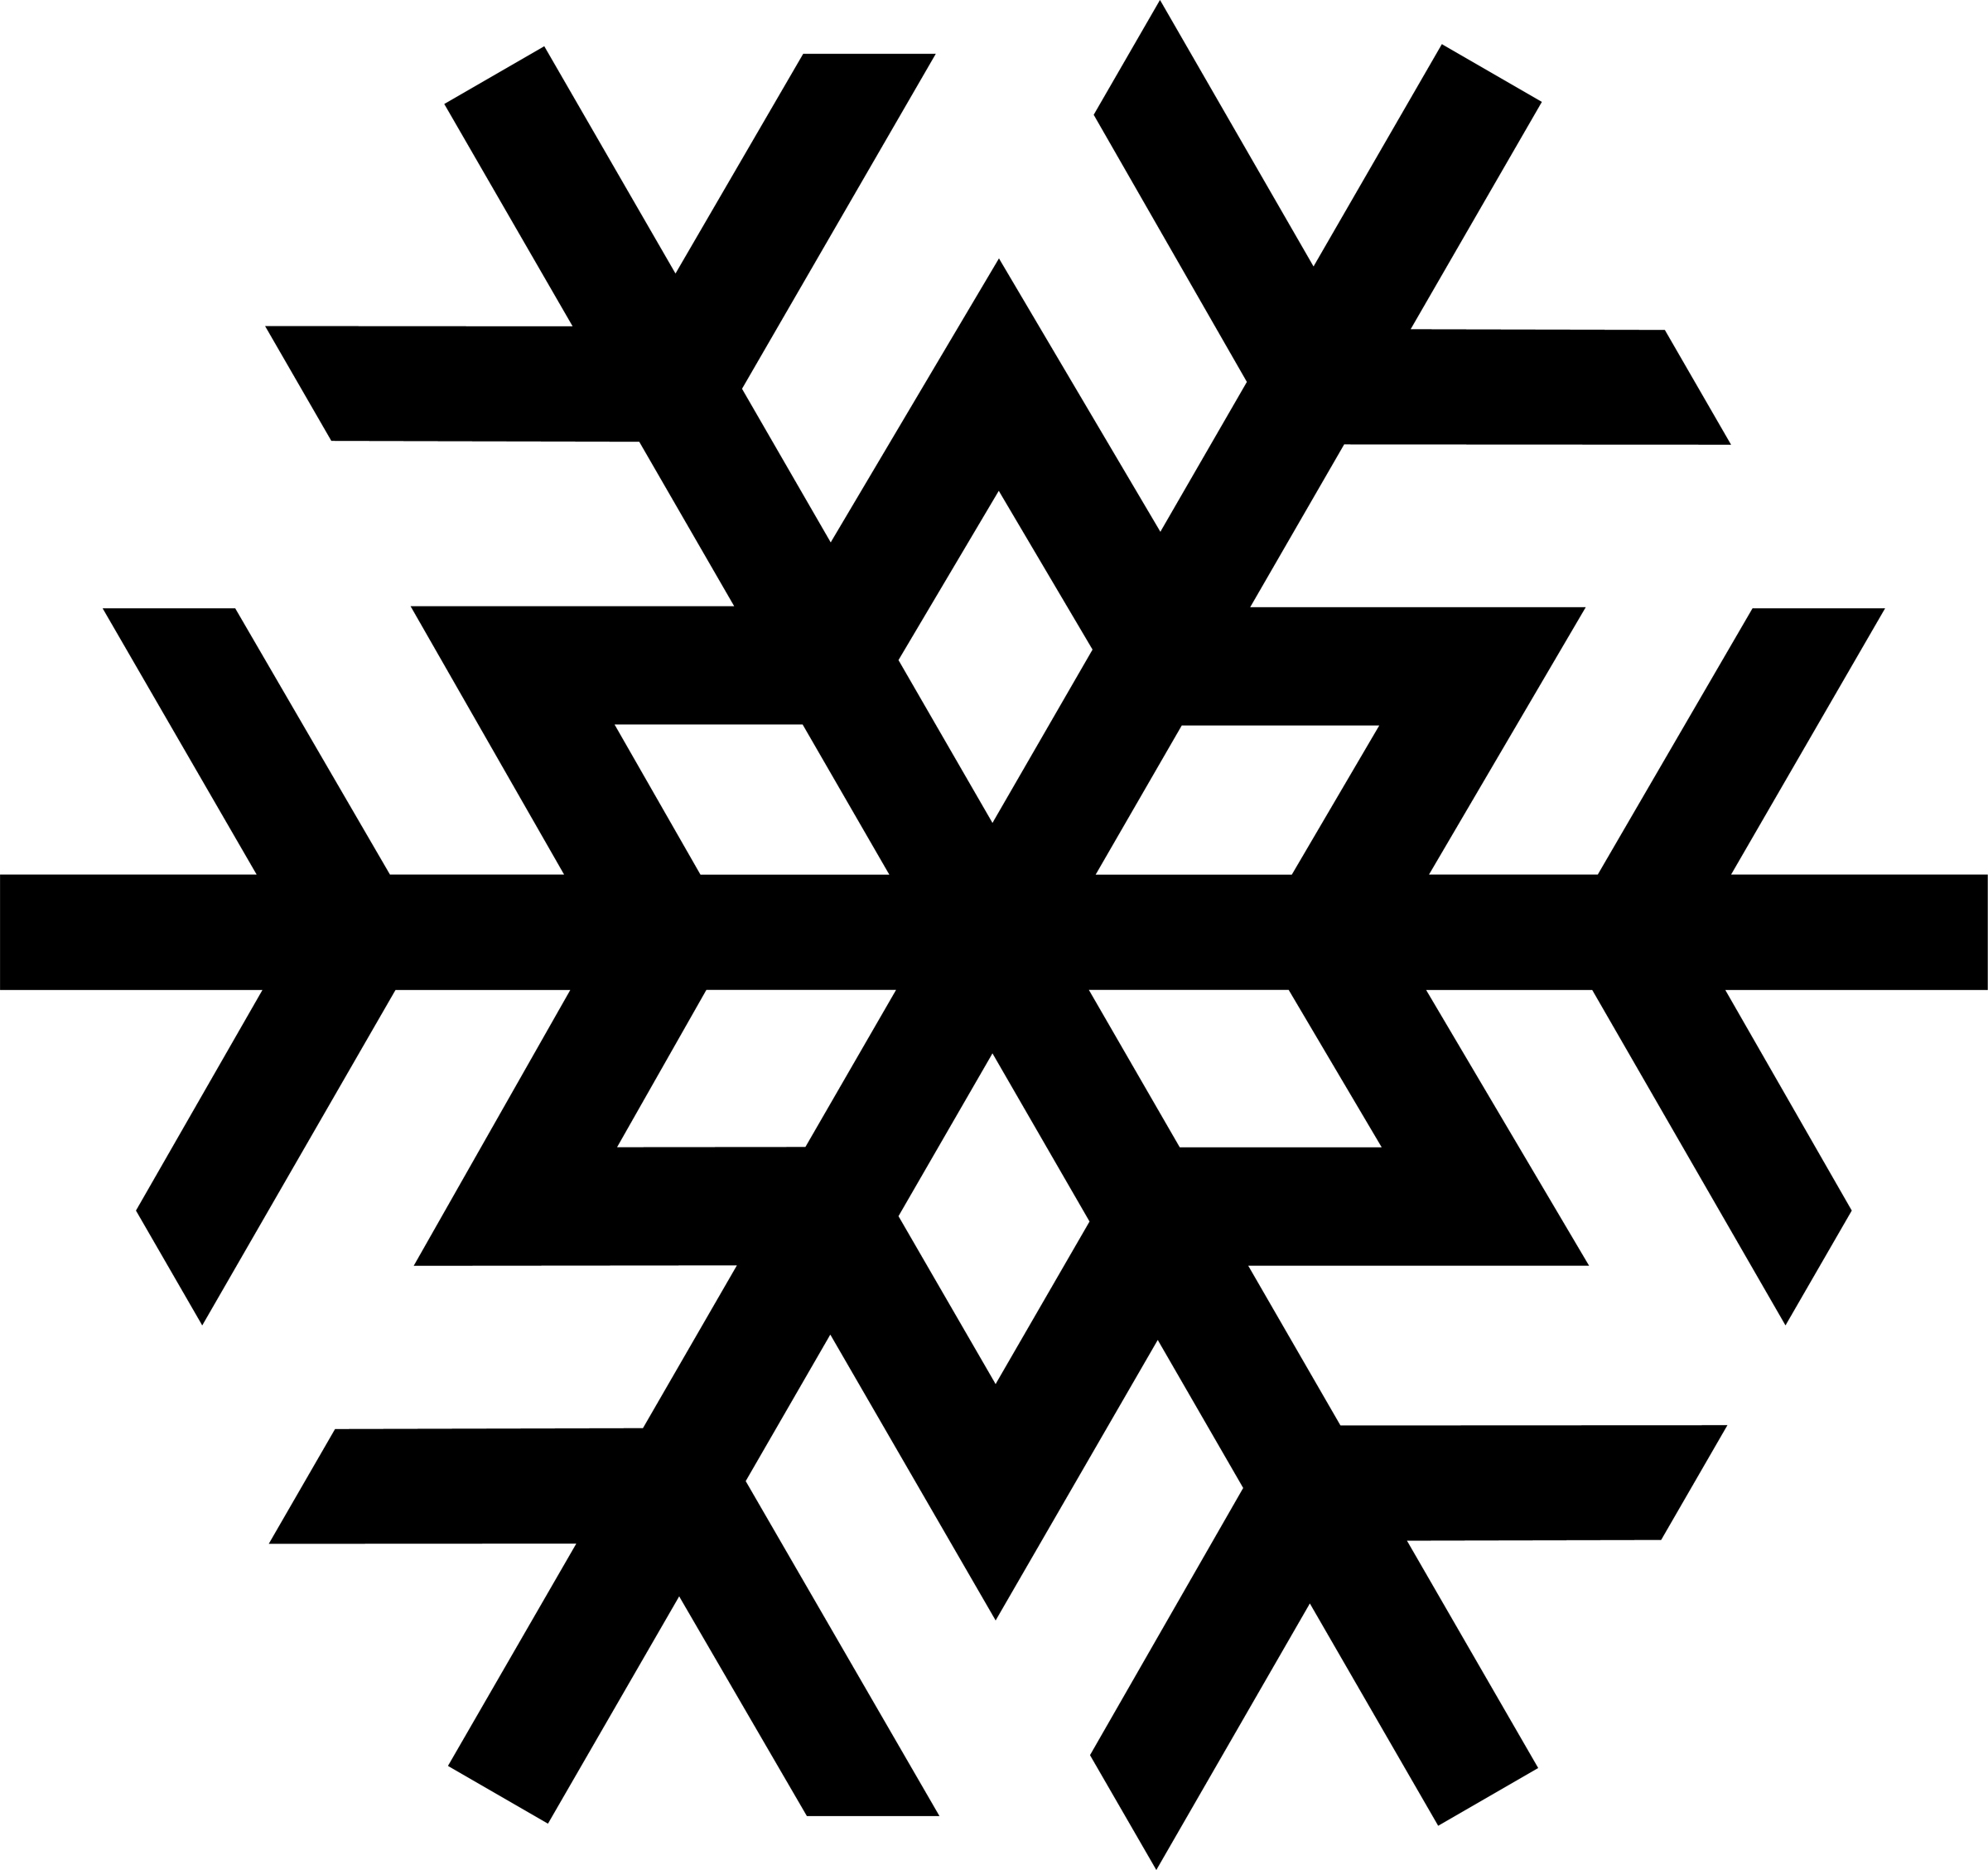 Black Snowflake Clipart | Clipart Panda - Free Clipart Images